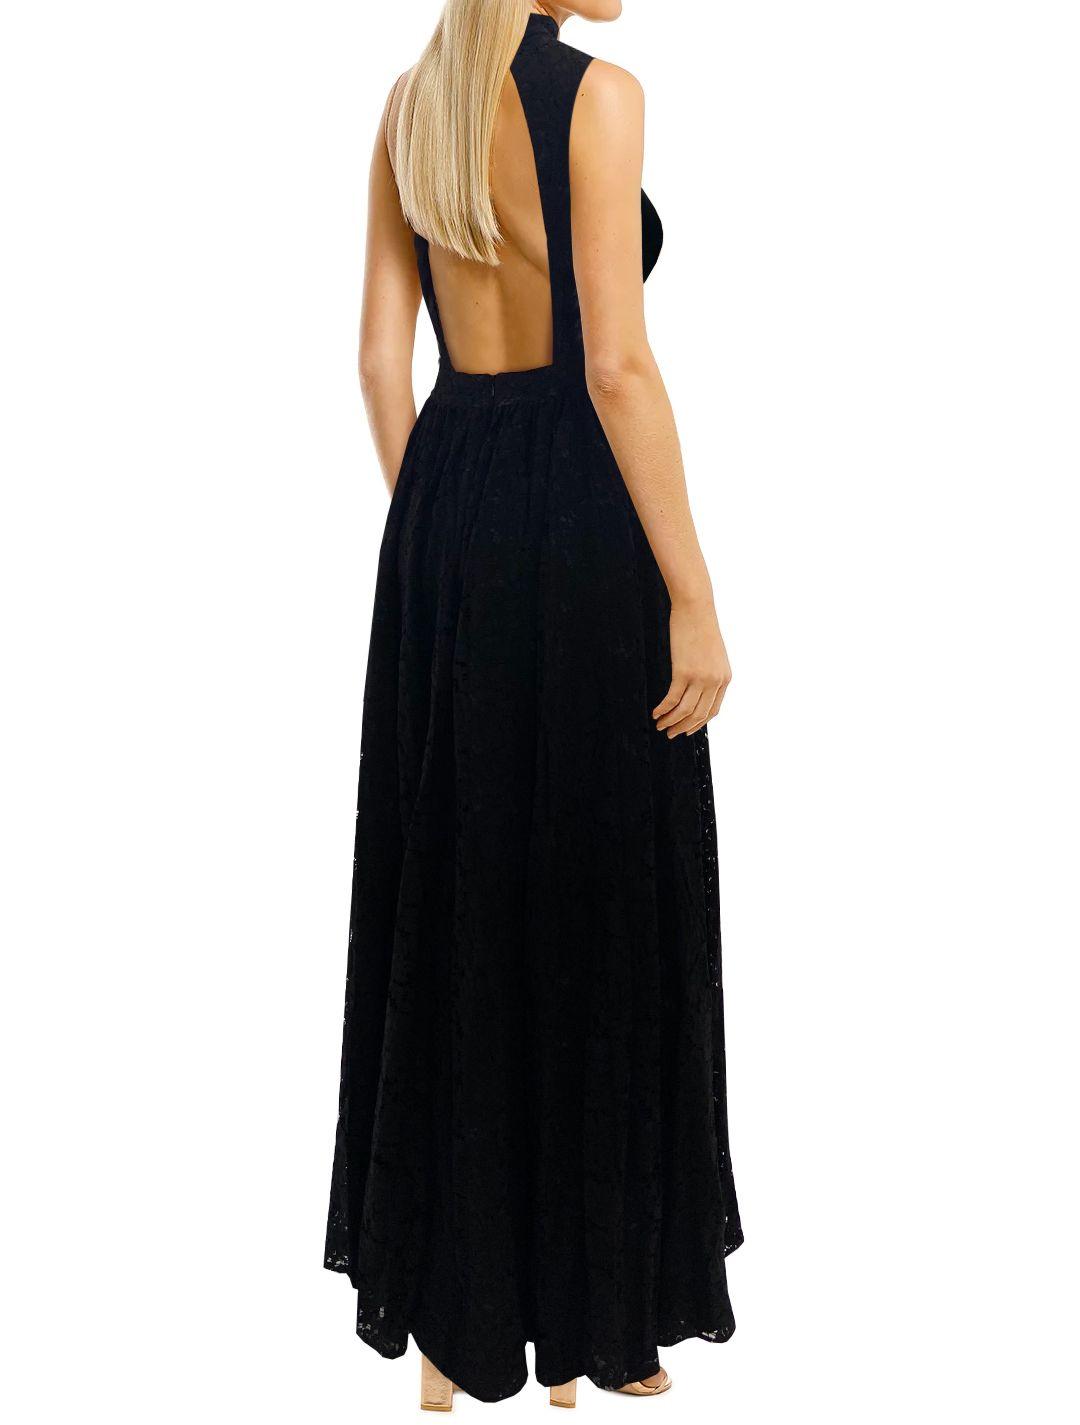 Fame-and-Partners-Tabitha-Dress-Black-Lace-Maxi-Dress-Back